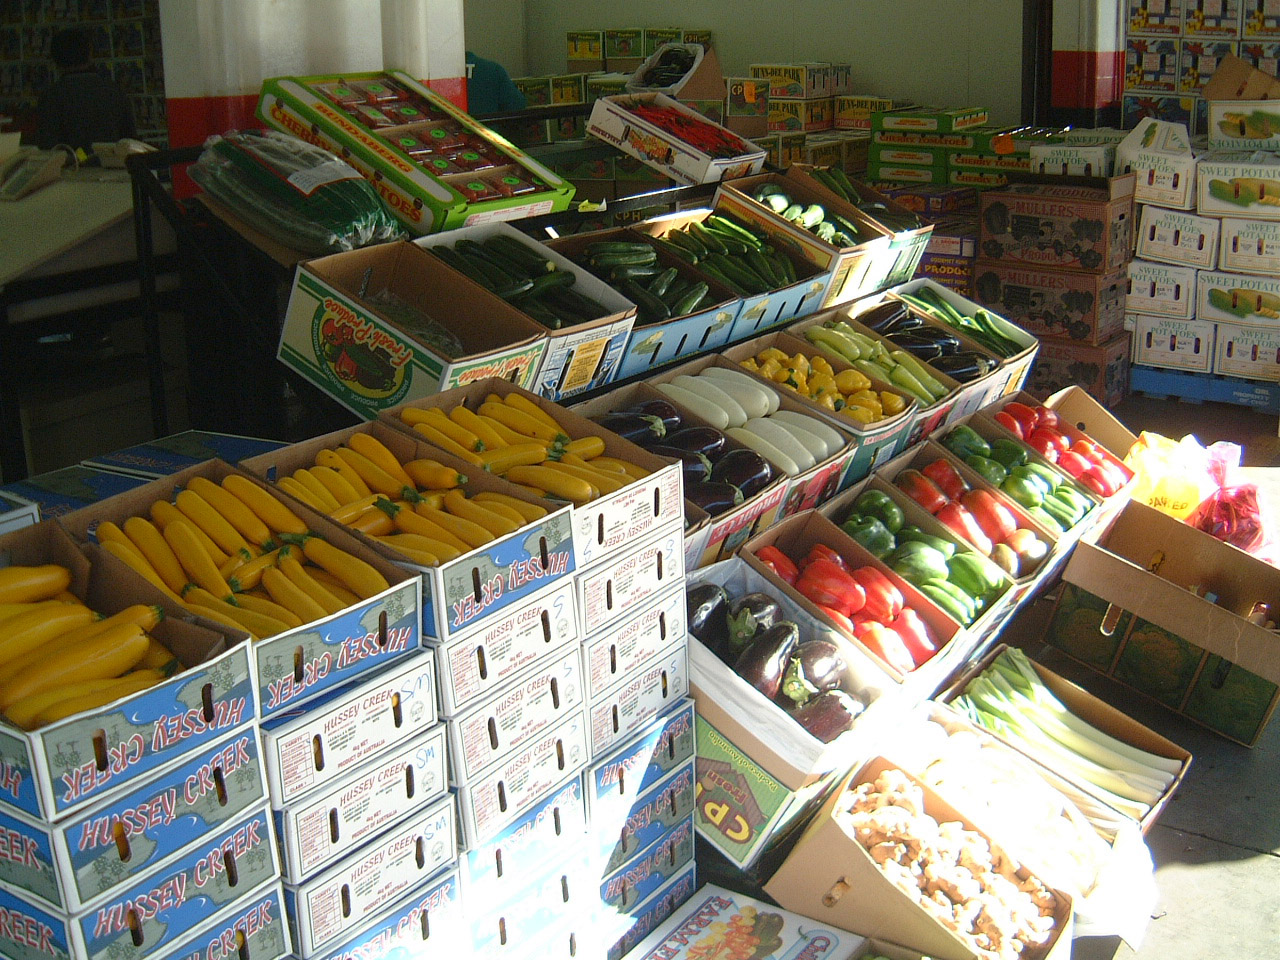 Brisbane Markets Sherwood Road Rocklea Queensland 4106 zucchini I01